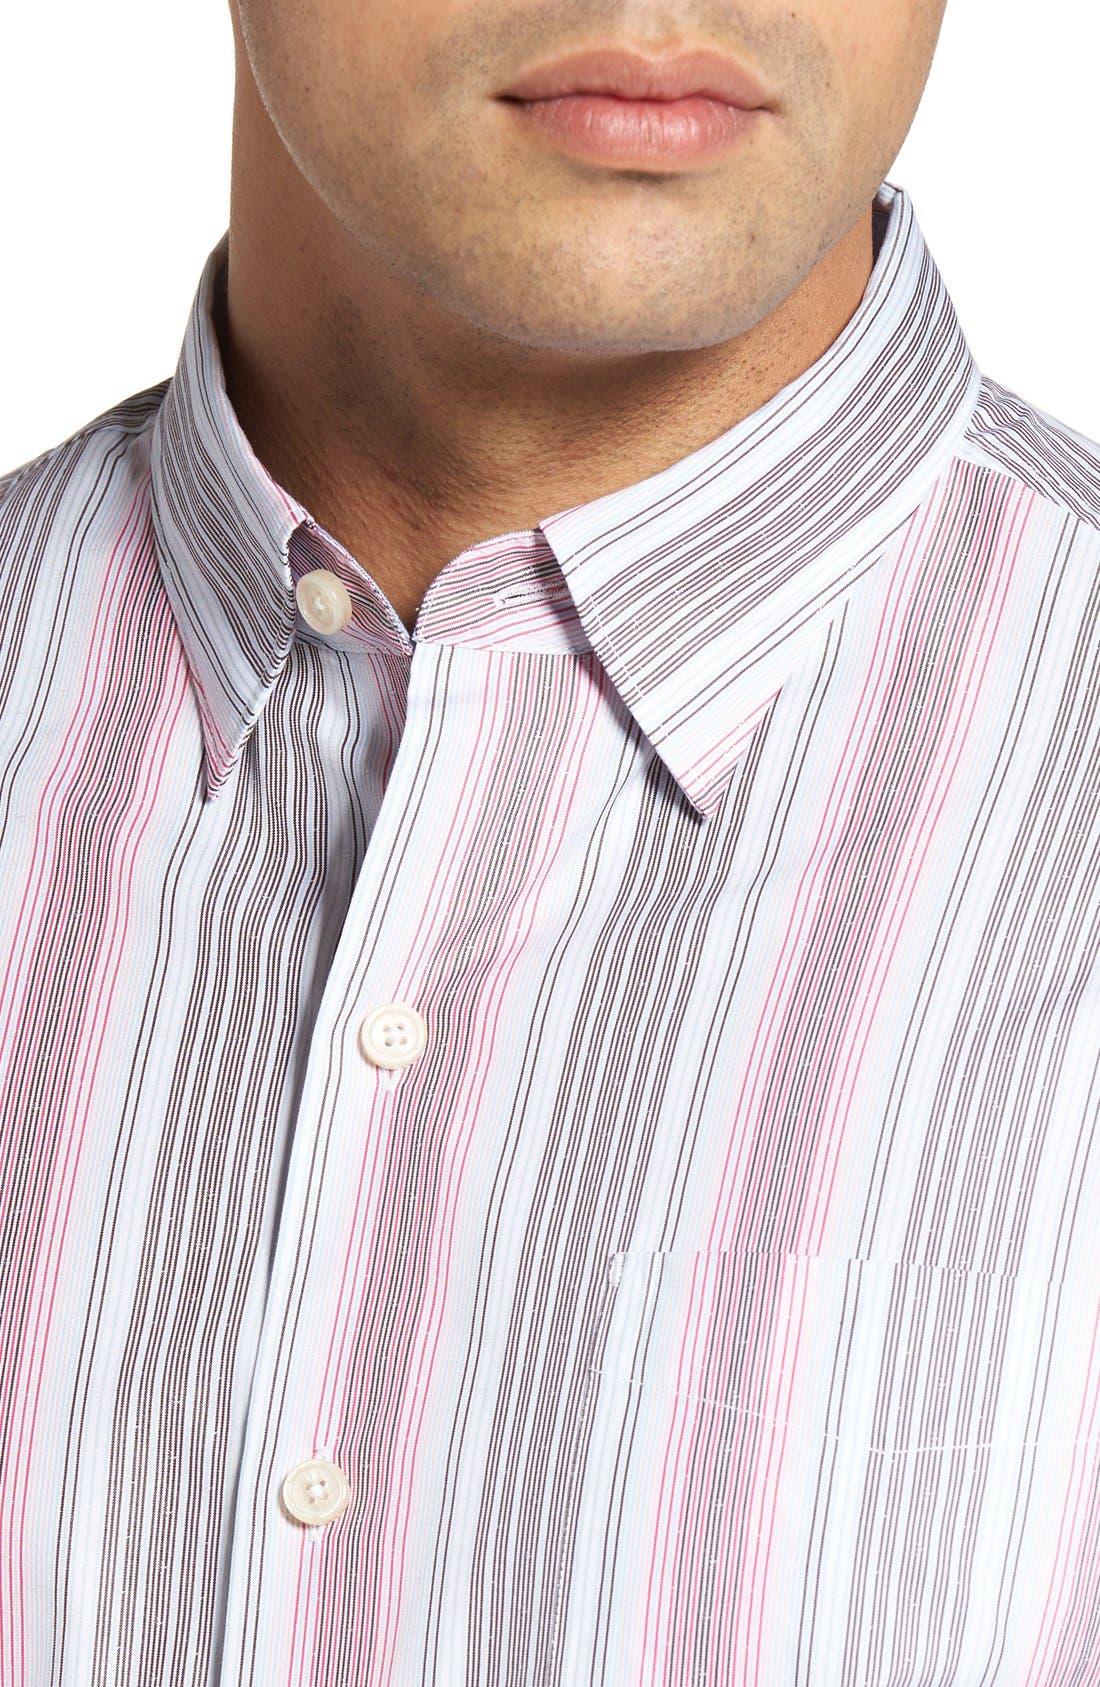 Roda Viva Original Fit Sport Shirt,                             Alternate thumbnail 8, color,                             400